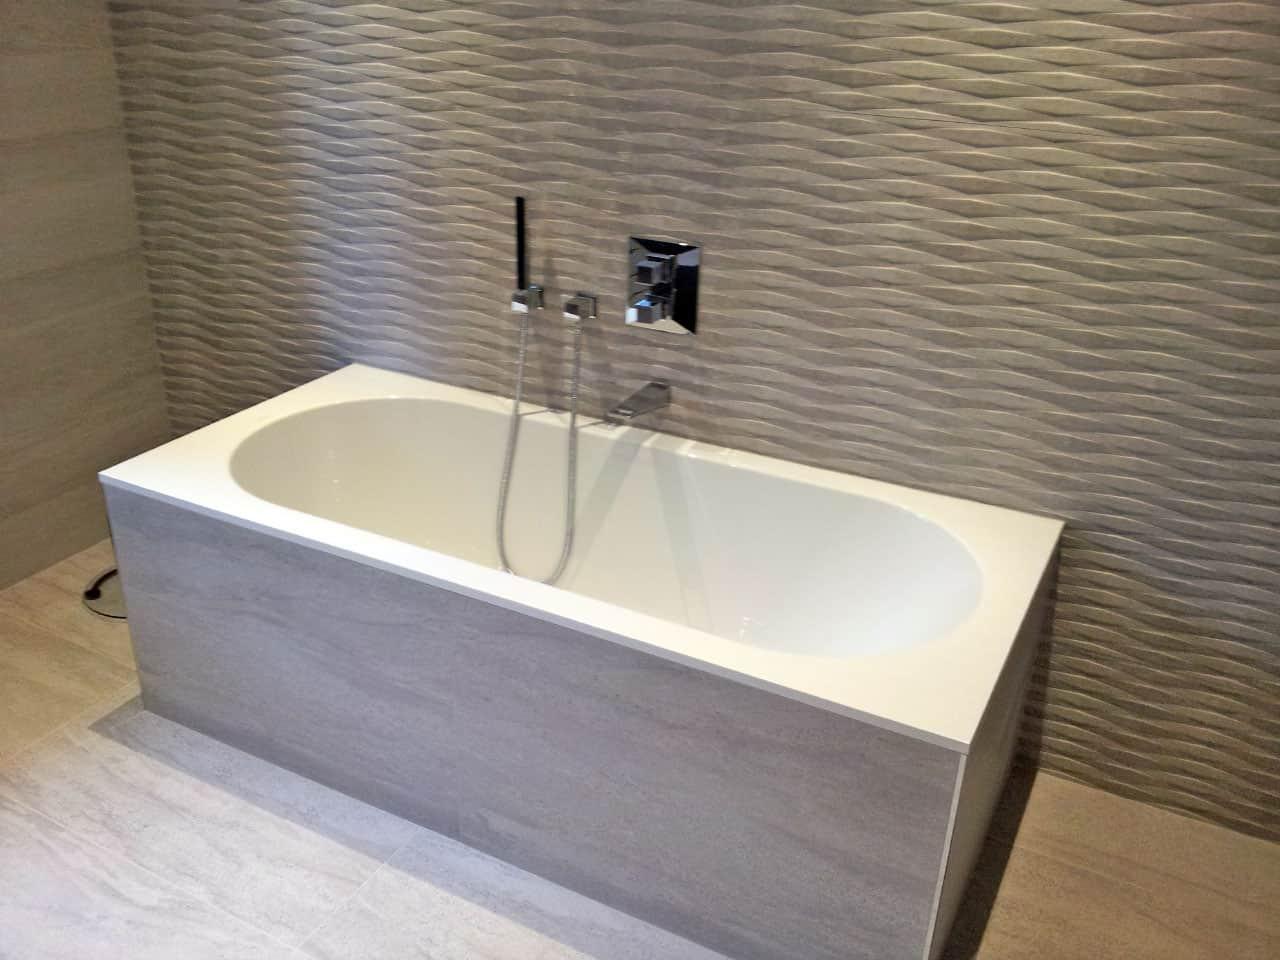 Installation de baignoire